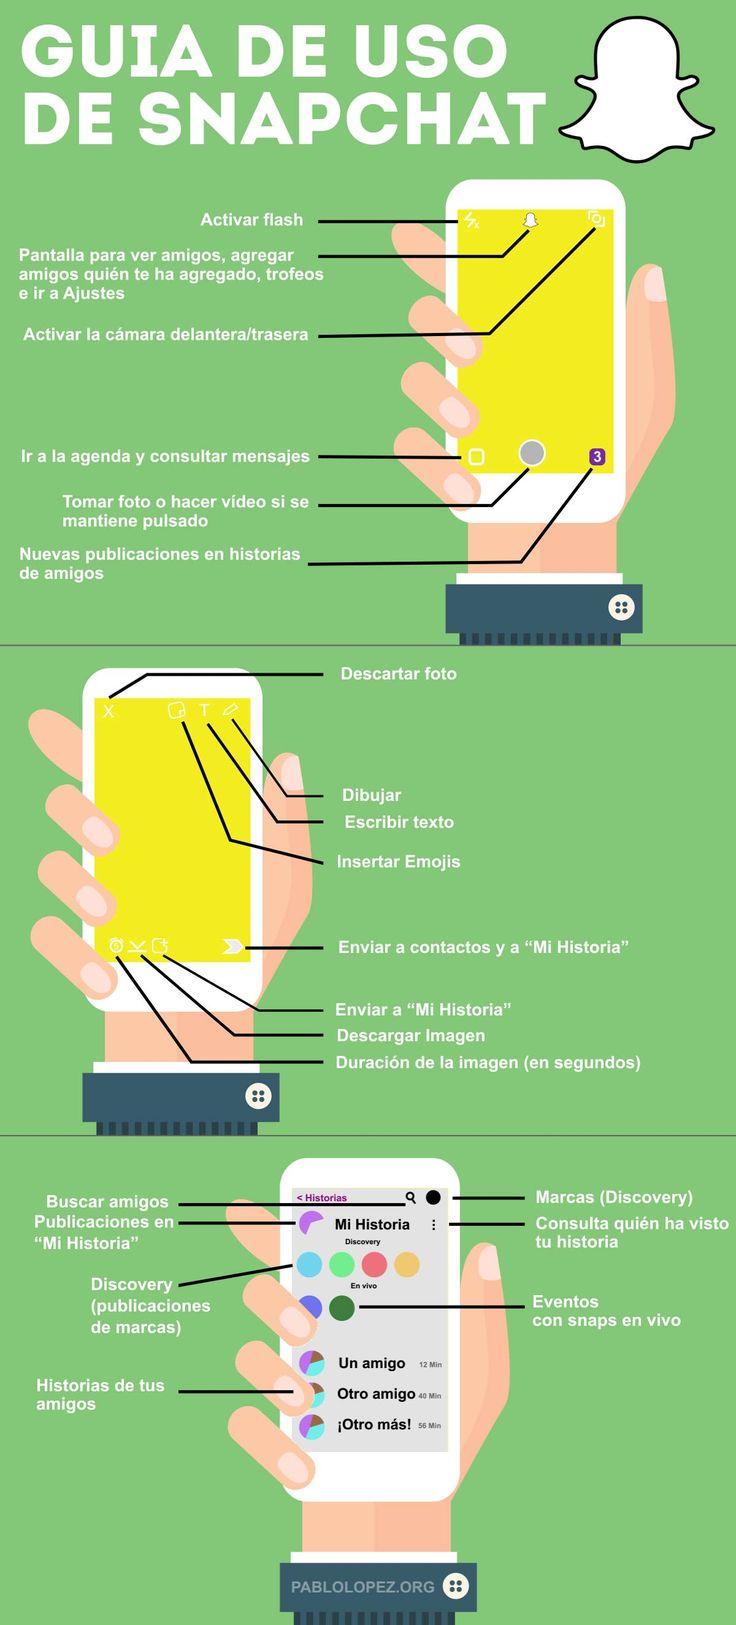 Guía de uso de SnapChat #Infografía